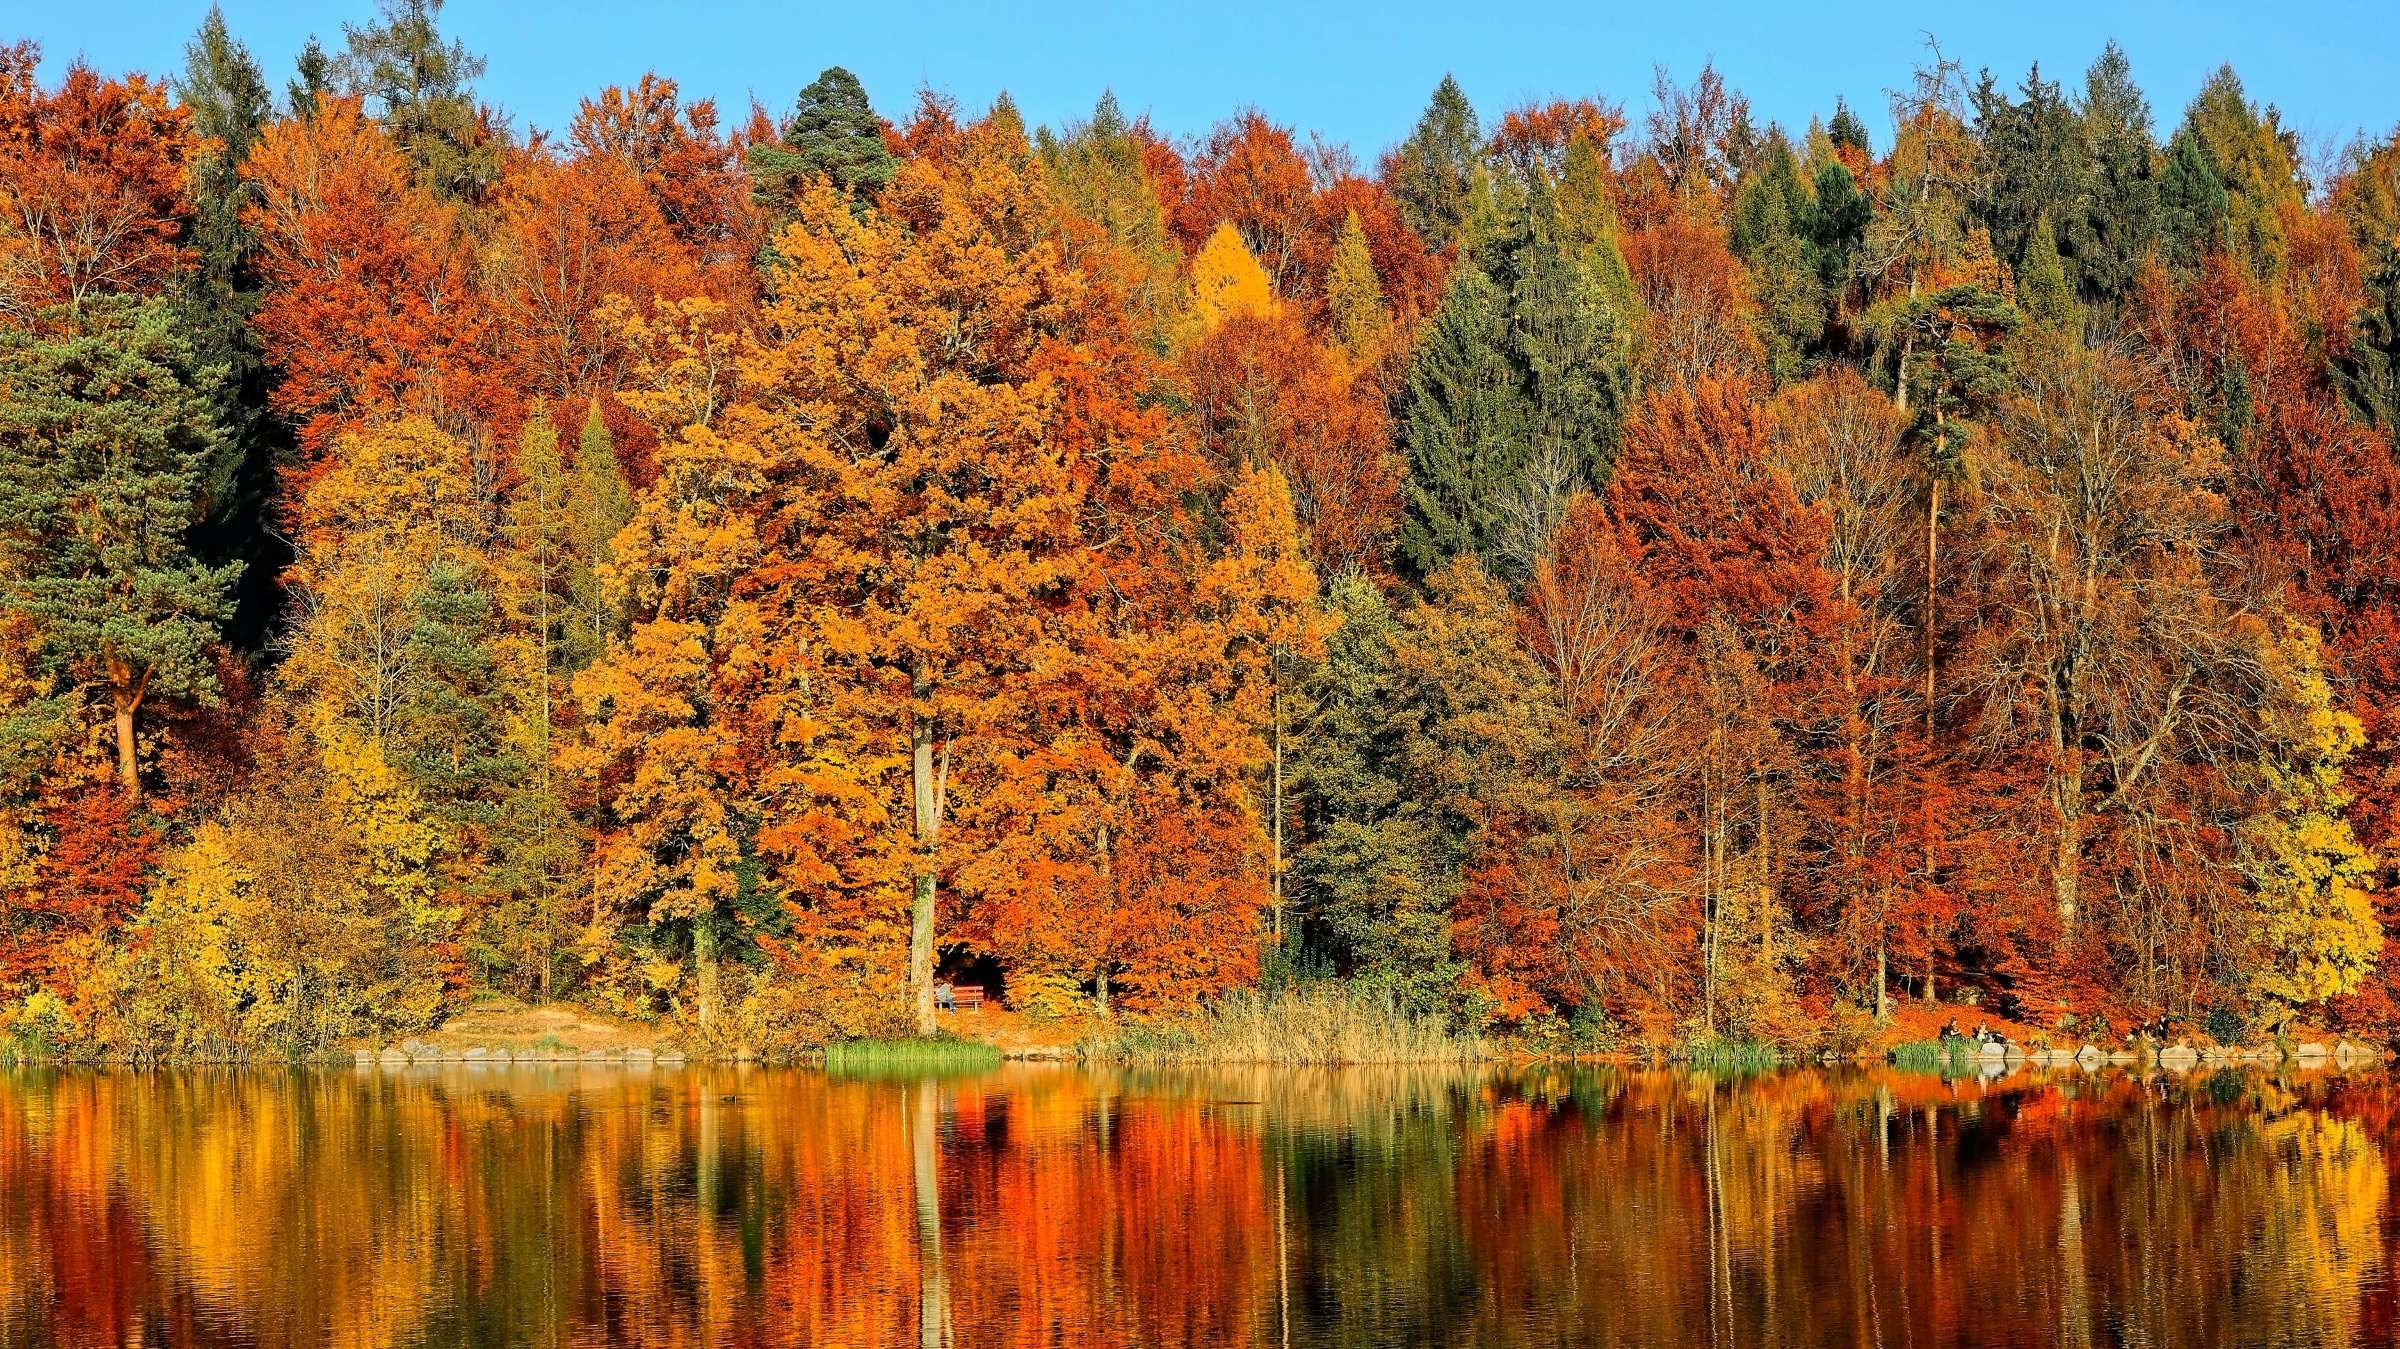 Take a Virtual Fall Foliage Tour With These Nature Webcams